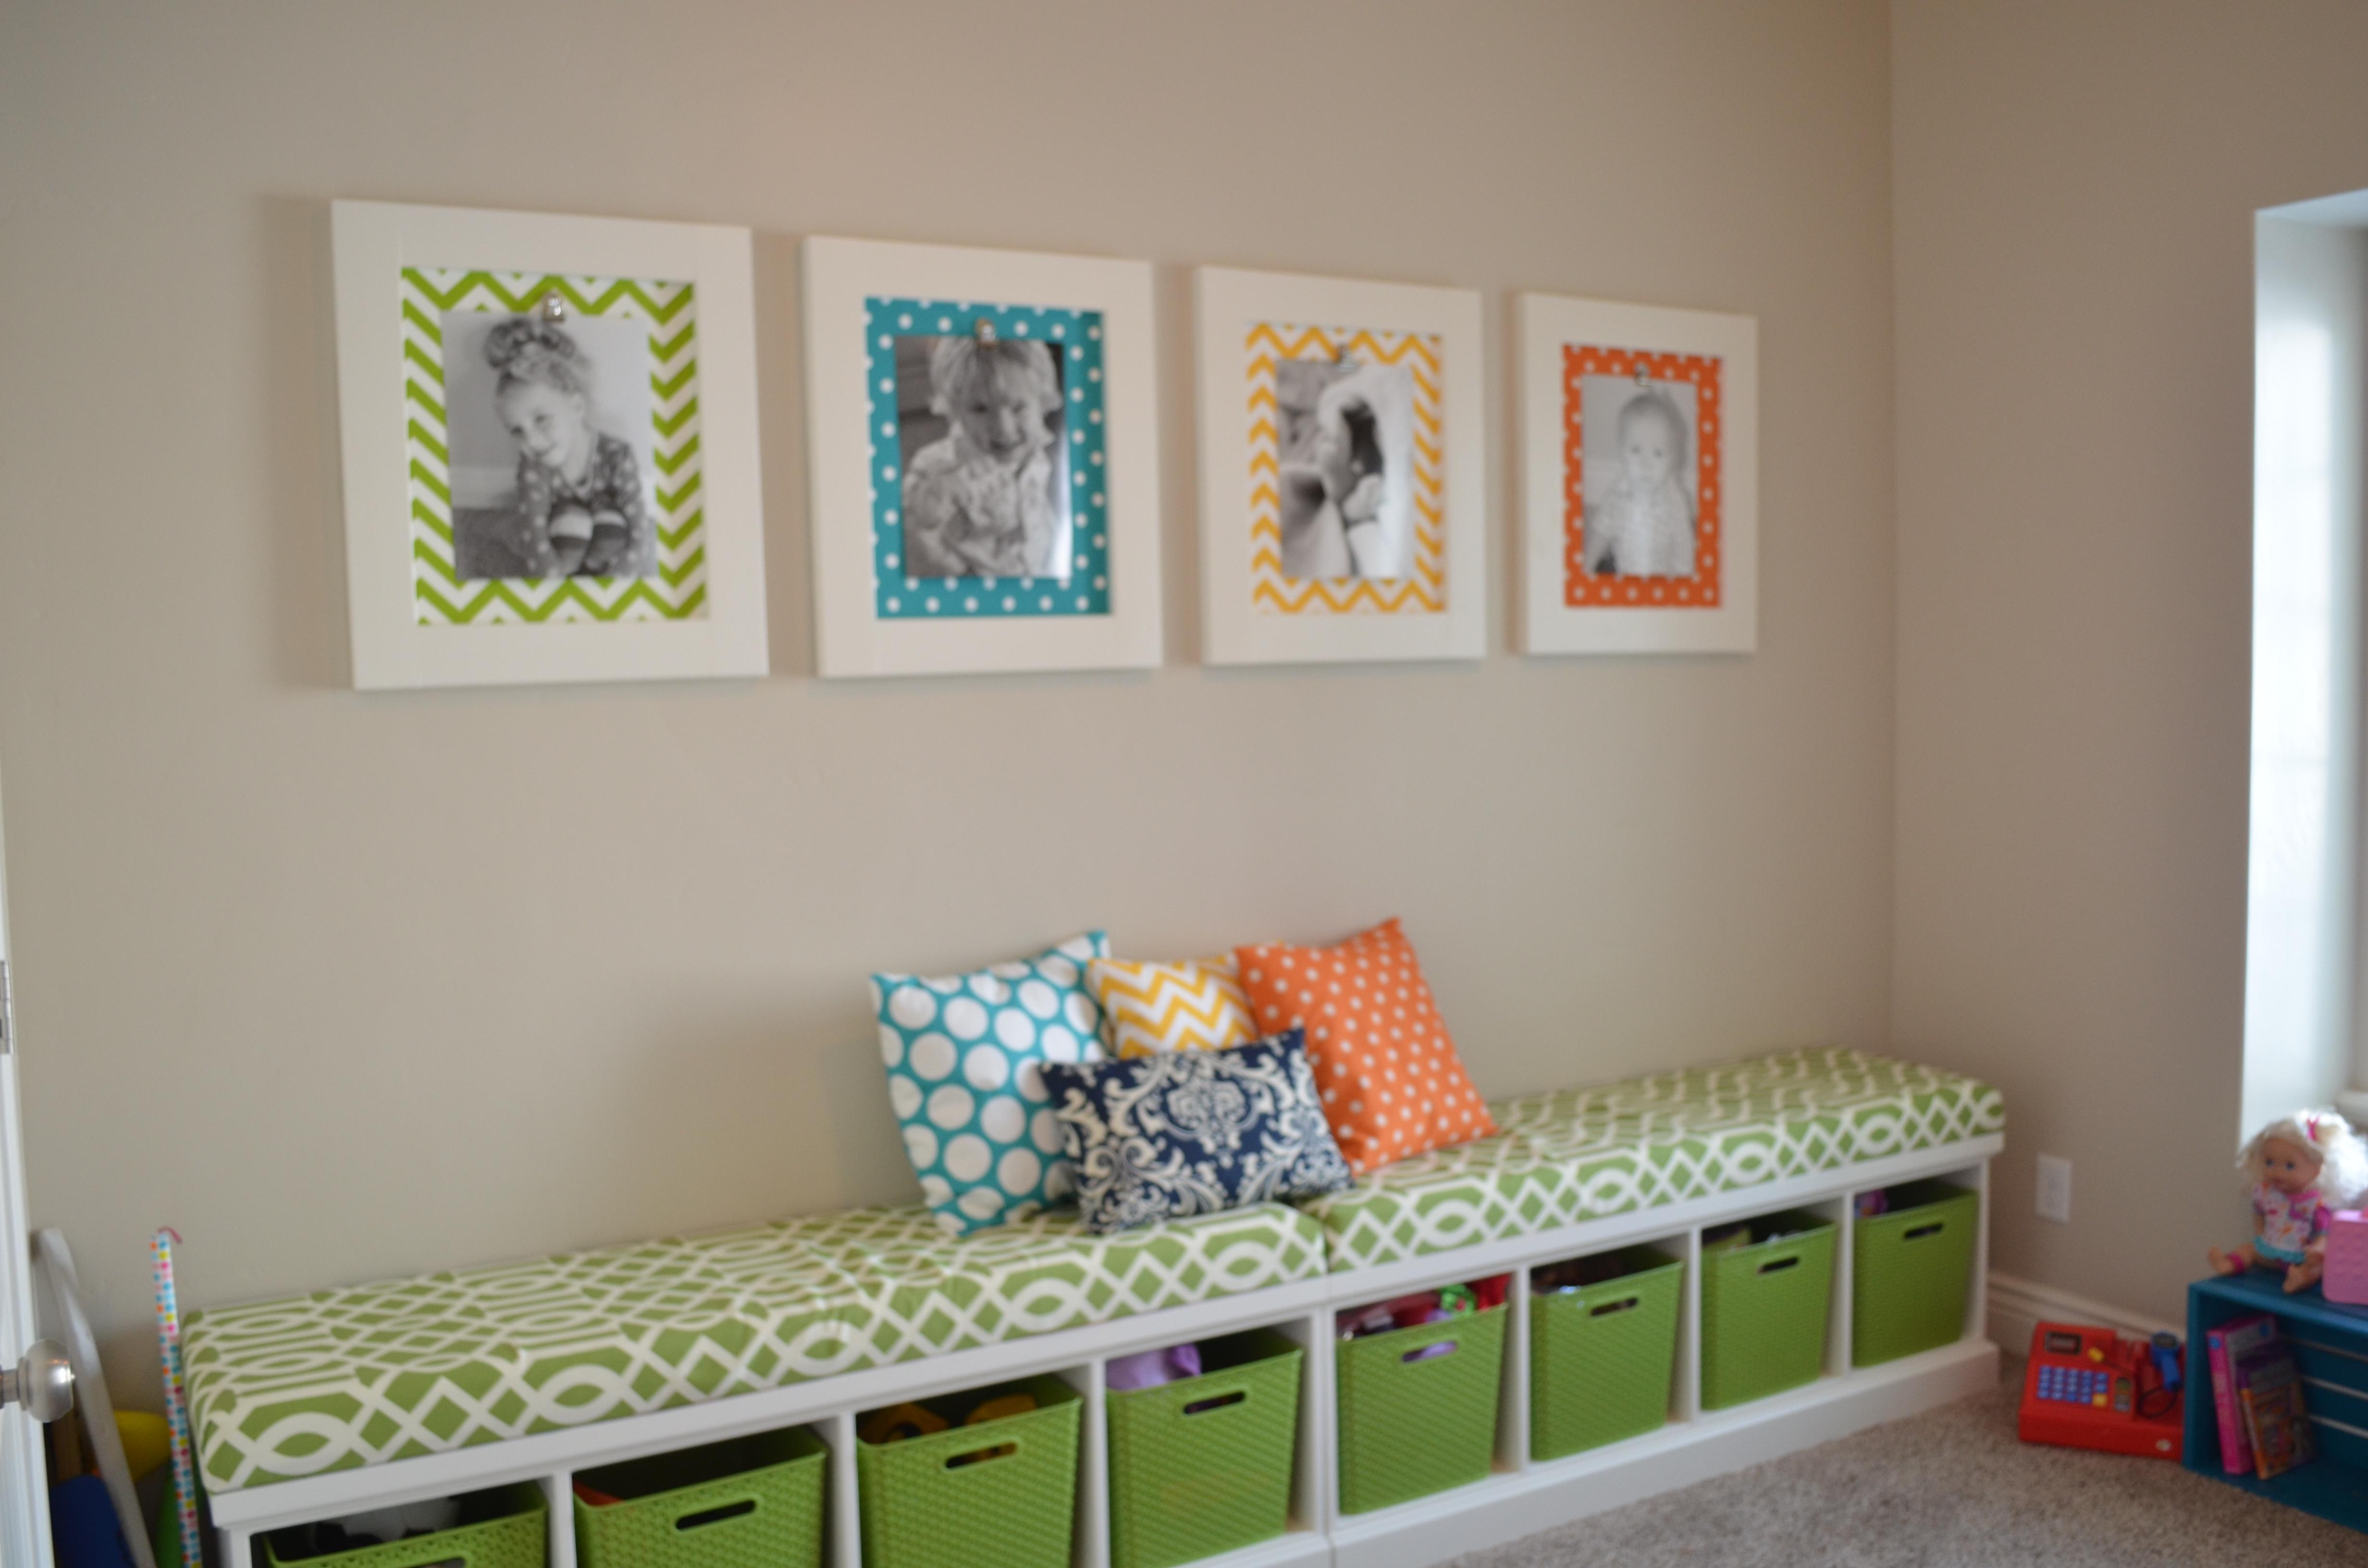 Playroom Design Sunlit Es Diy Home Decor Holiday